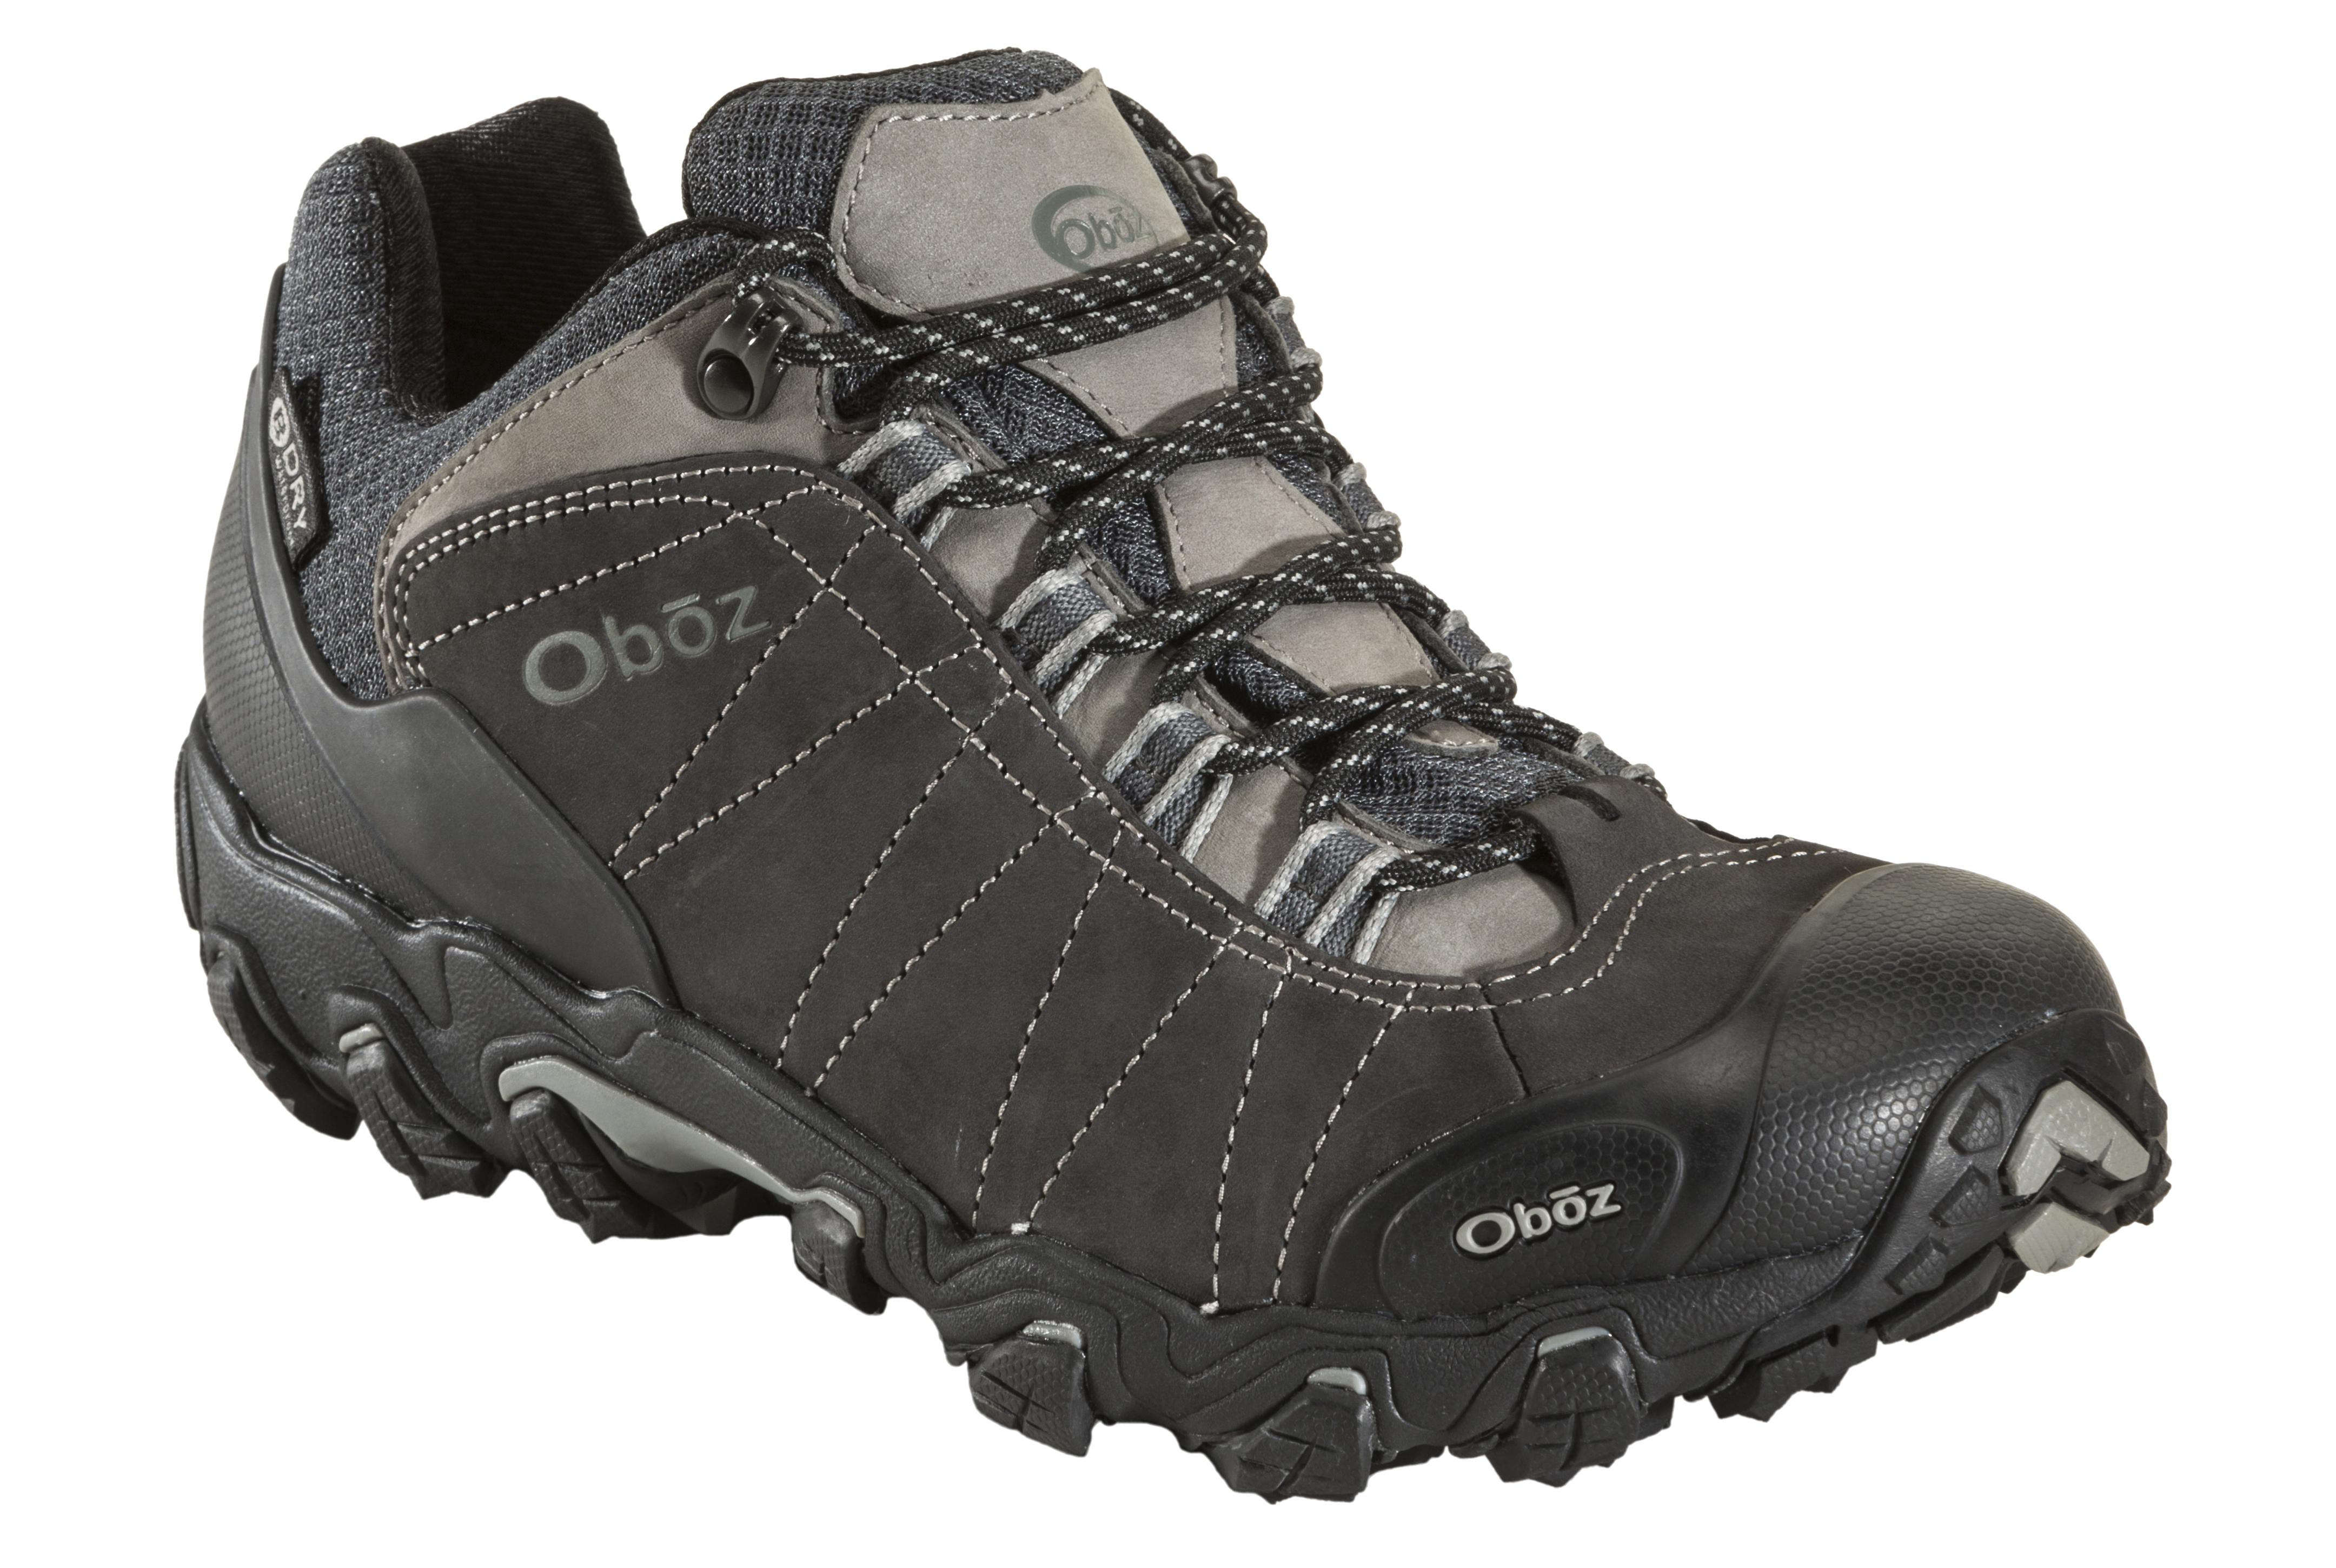 5729b4803b6 Oboz Bridger Low Light Trail Shoes - Men s